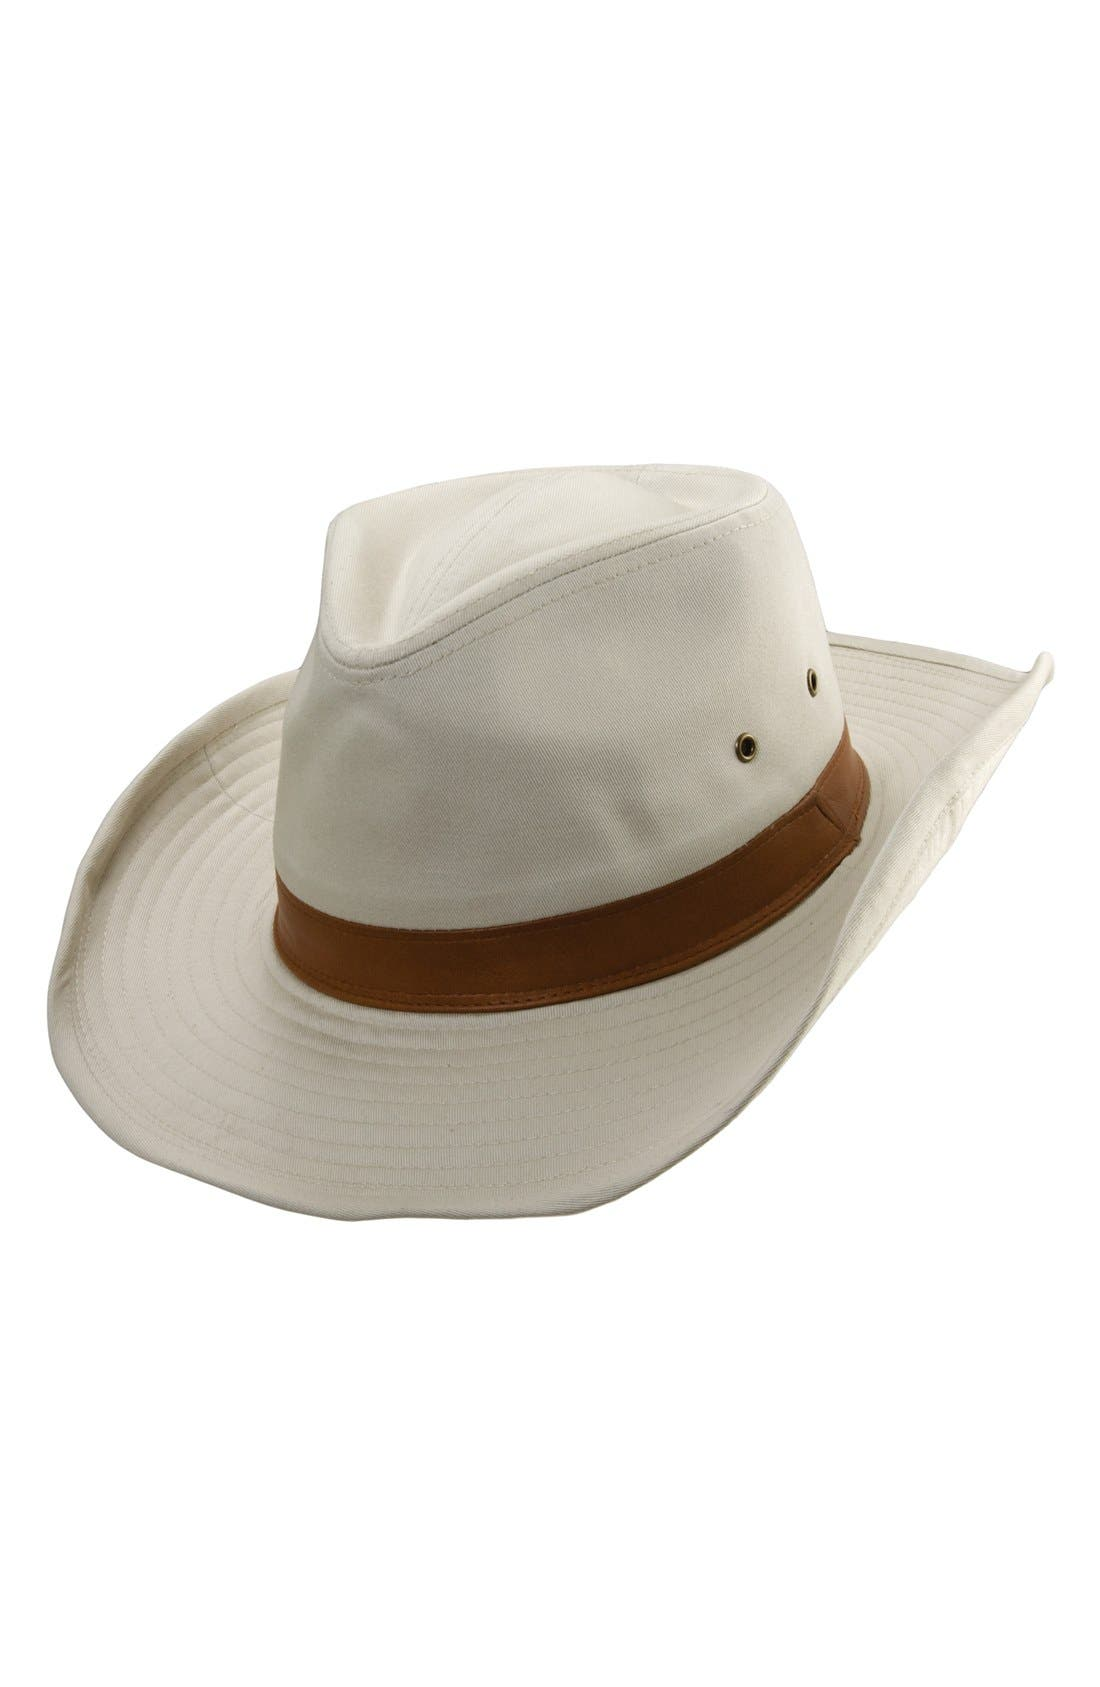 Main Image - Dorfman Pacific Cotton Outback Hat